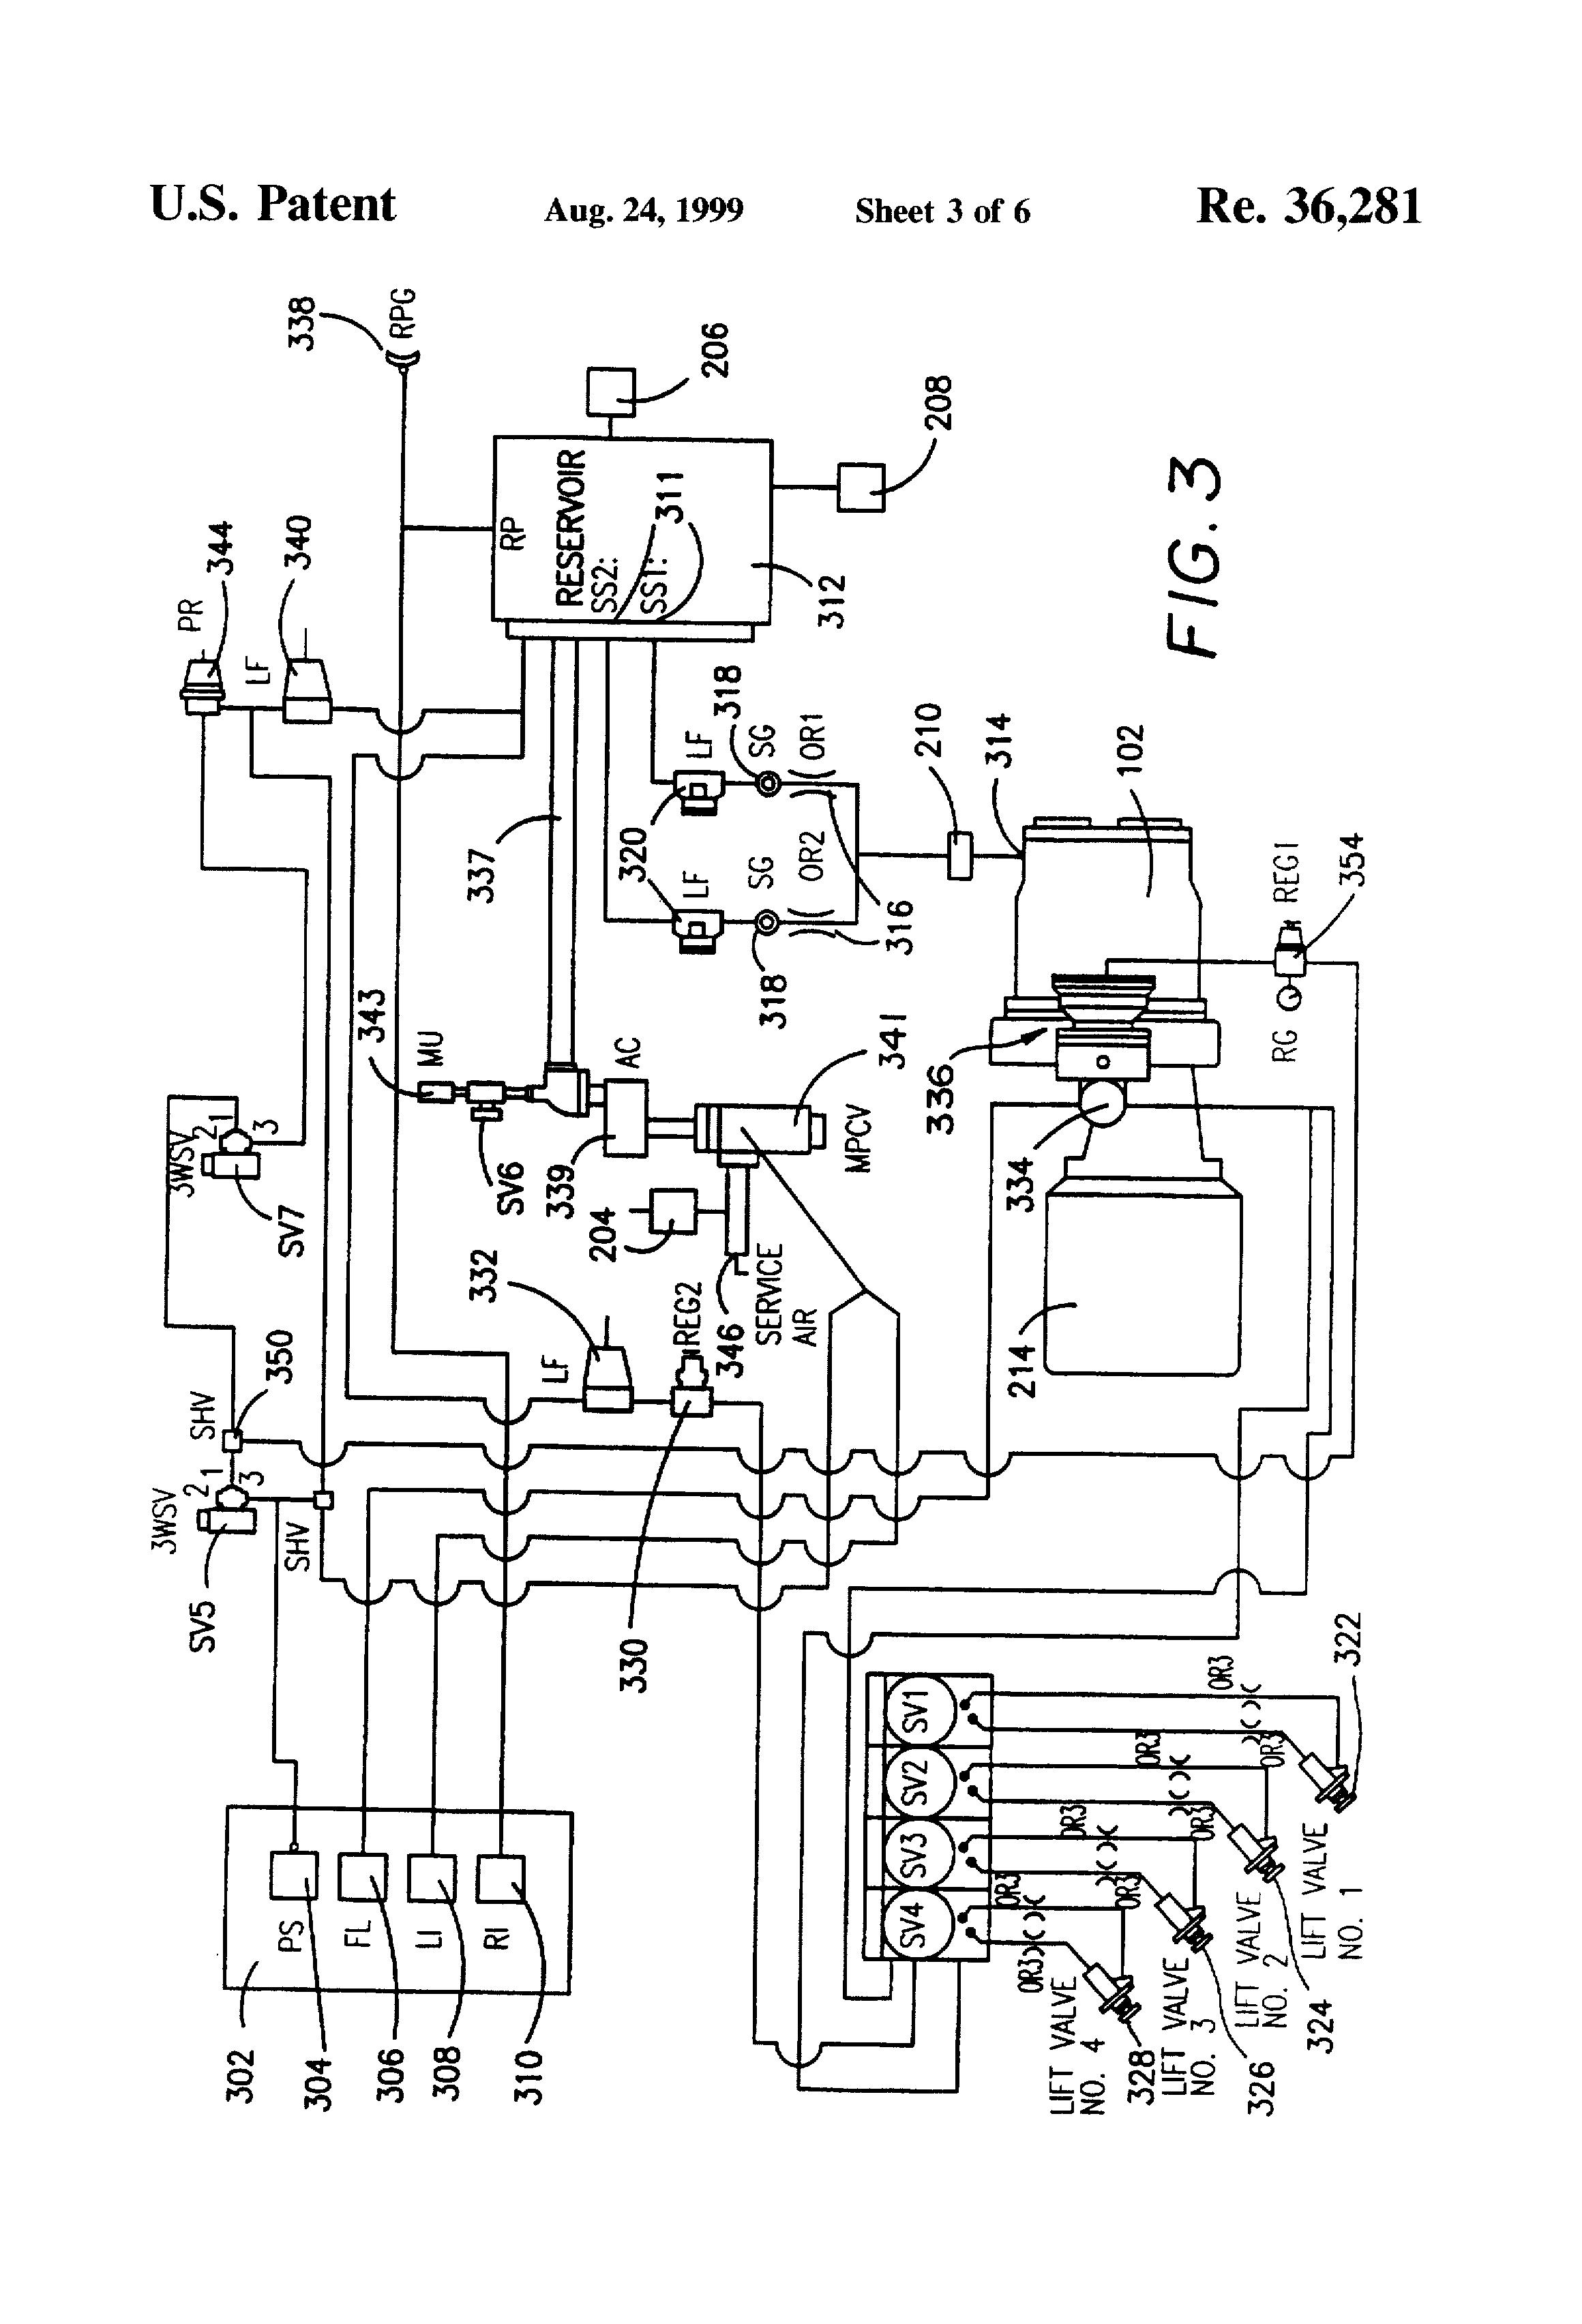 sullair 10b wiring diagram wiring diagrams best sullair 10b wiring diagram wiring diagram library hotsy wiring diagram sullair 10b wiring diagram